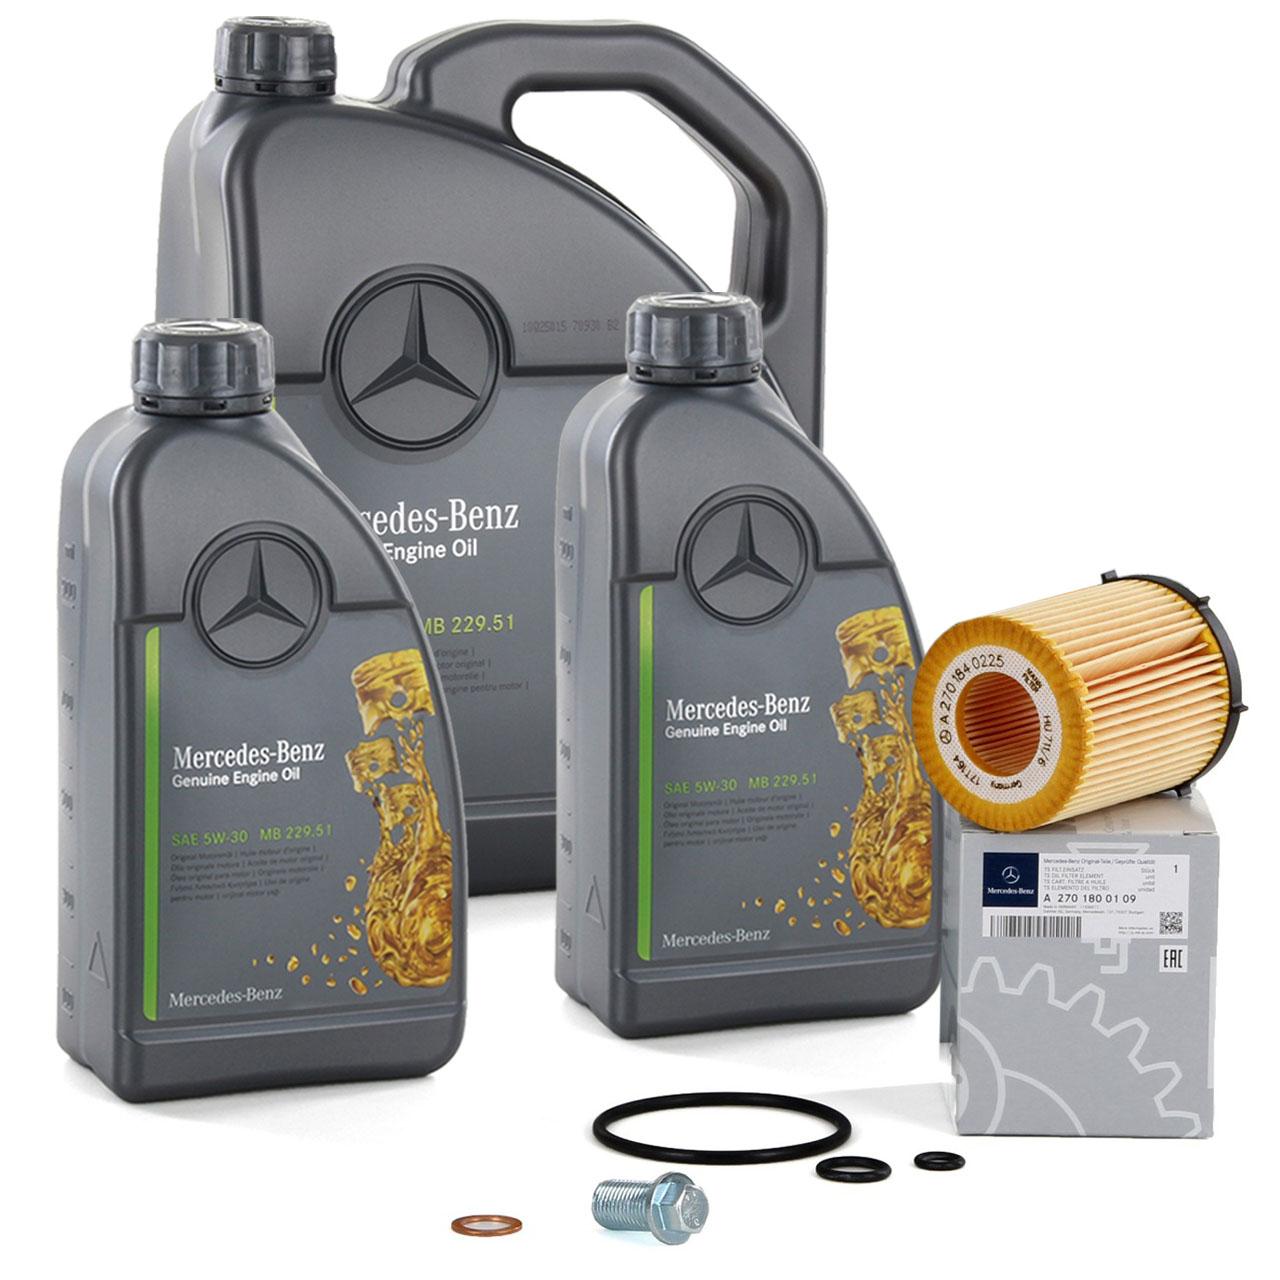 ORIGINAL Mercedes-Benz Motoröl 5W30 MB 229.51 7 Liter + Ölfilter 2701800109